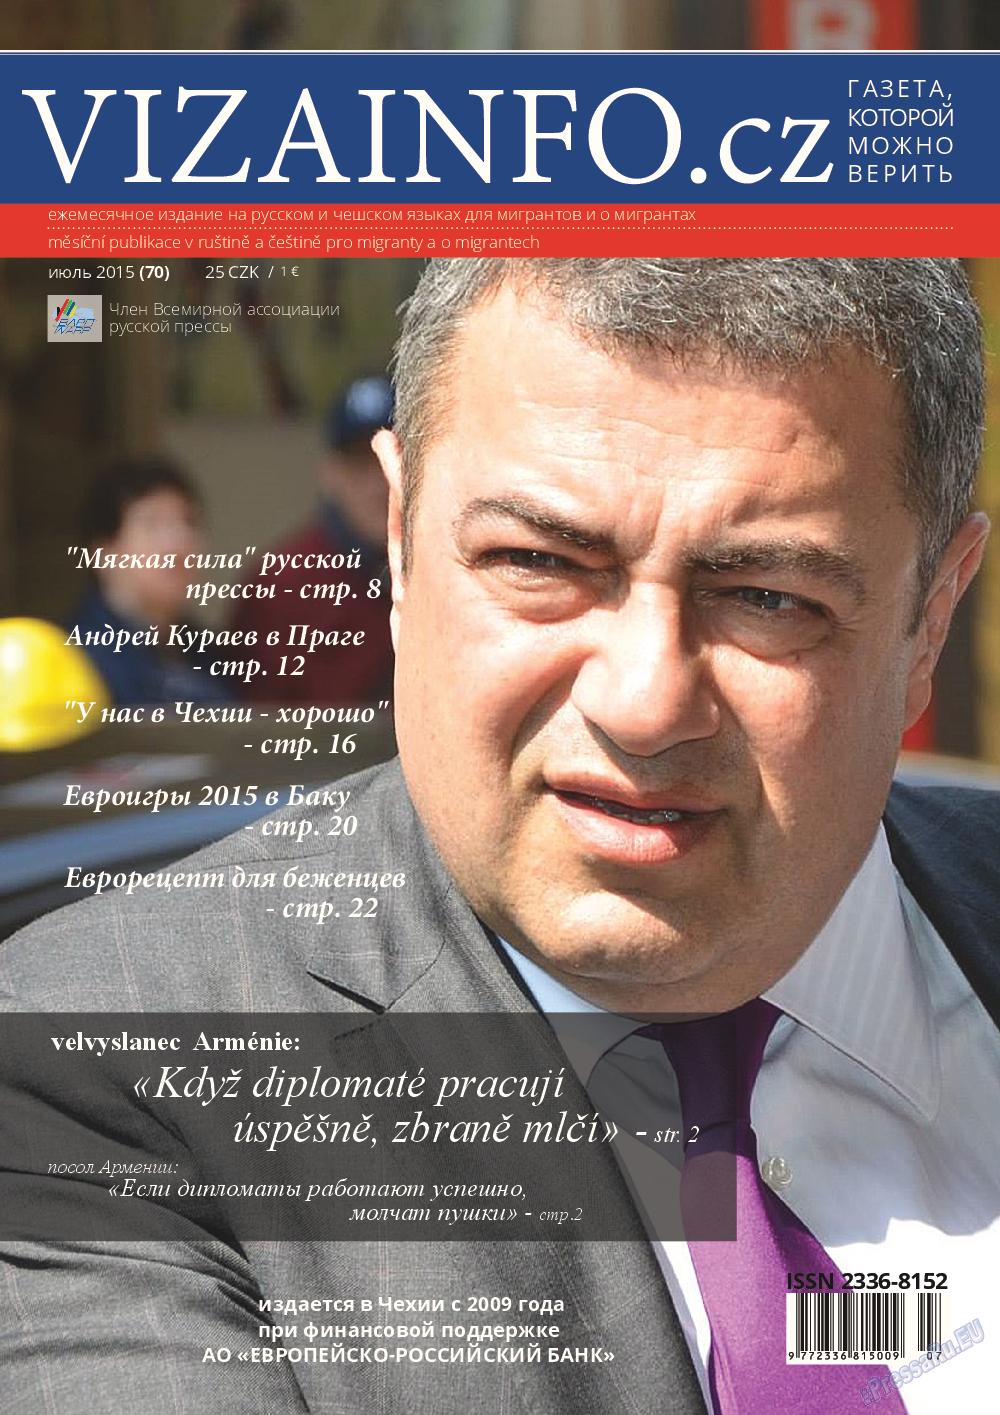 Vizainfo.cz (газета). 2015 год, номер 70, стр. 1